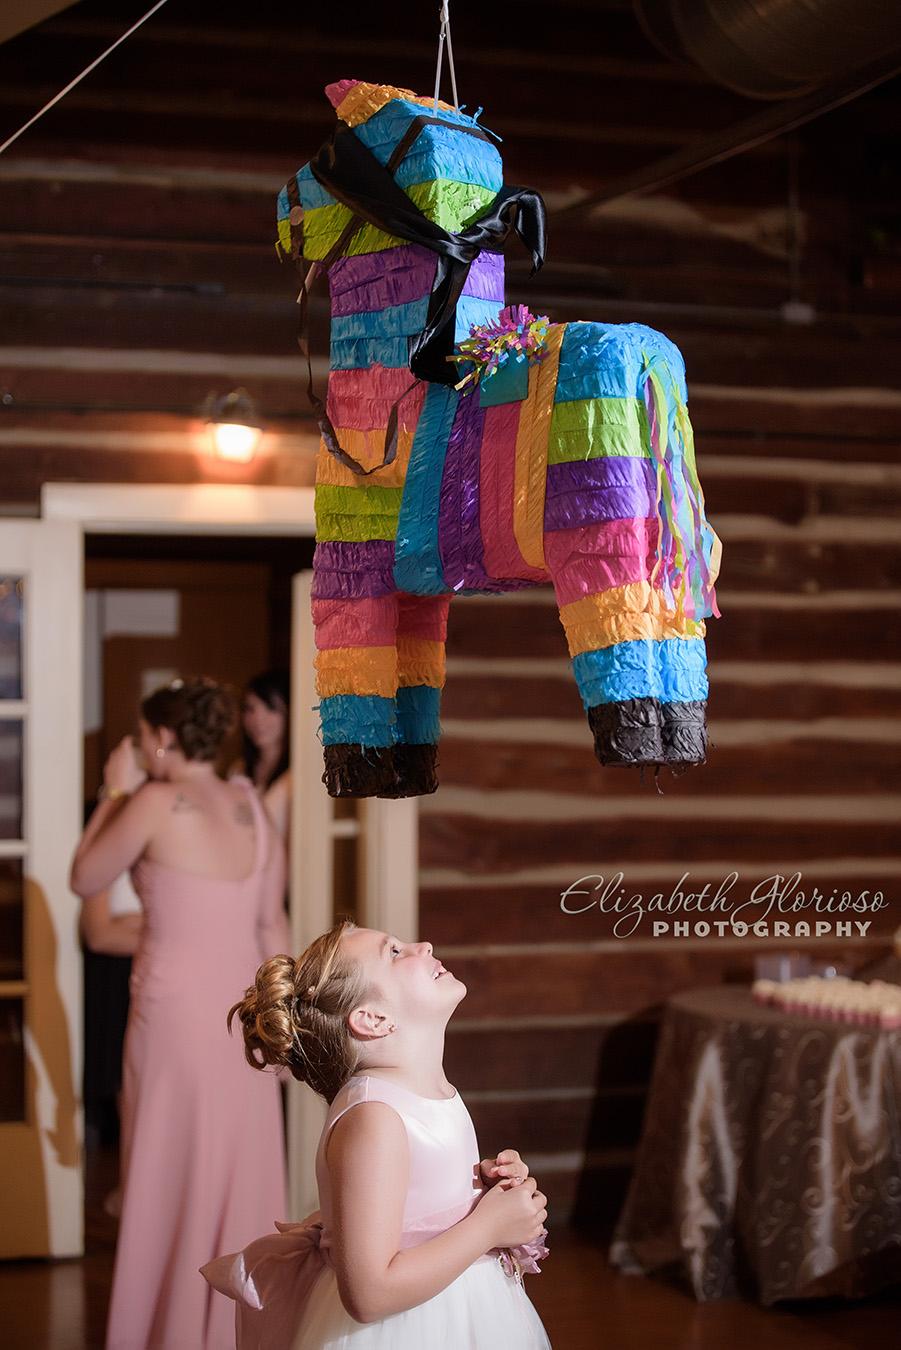 Vermilion_wedding_Glorioso Photography_1041